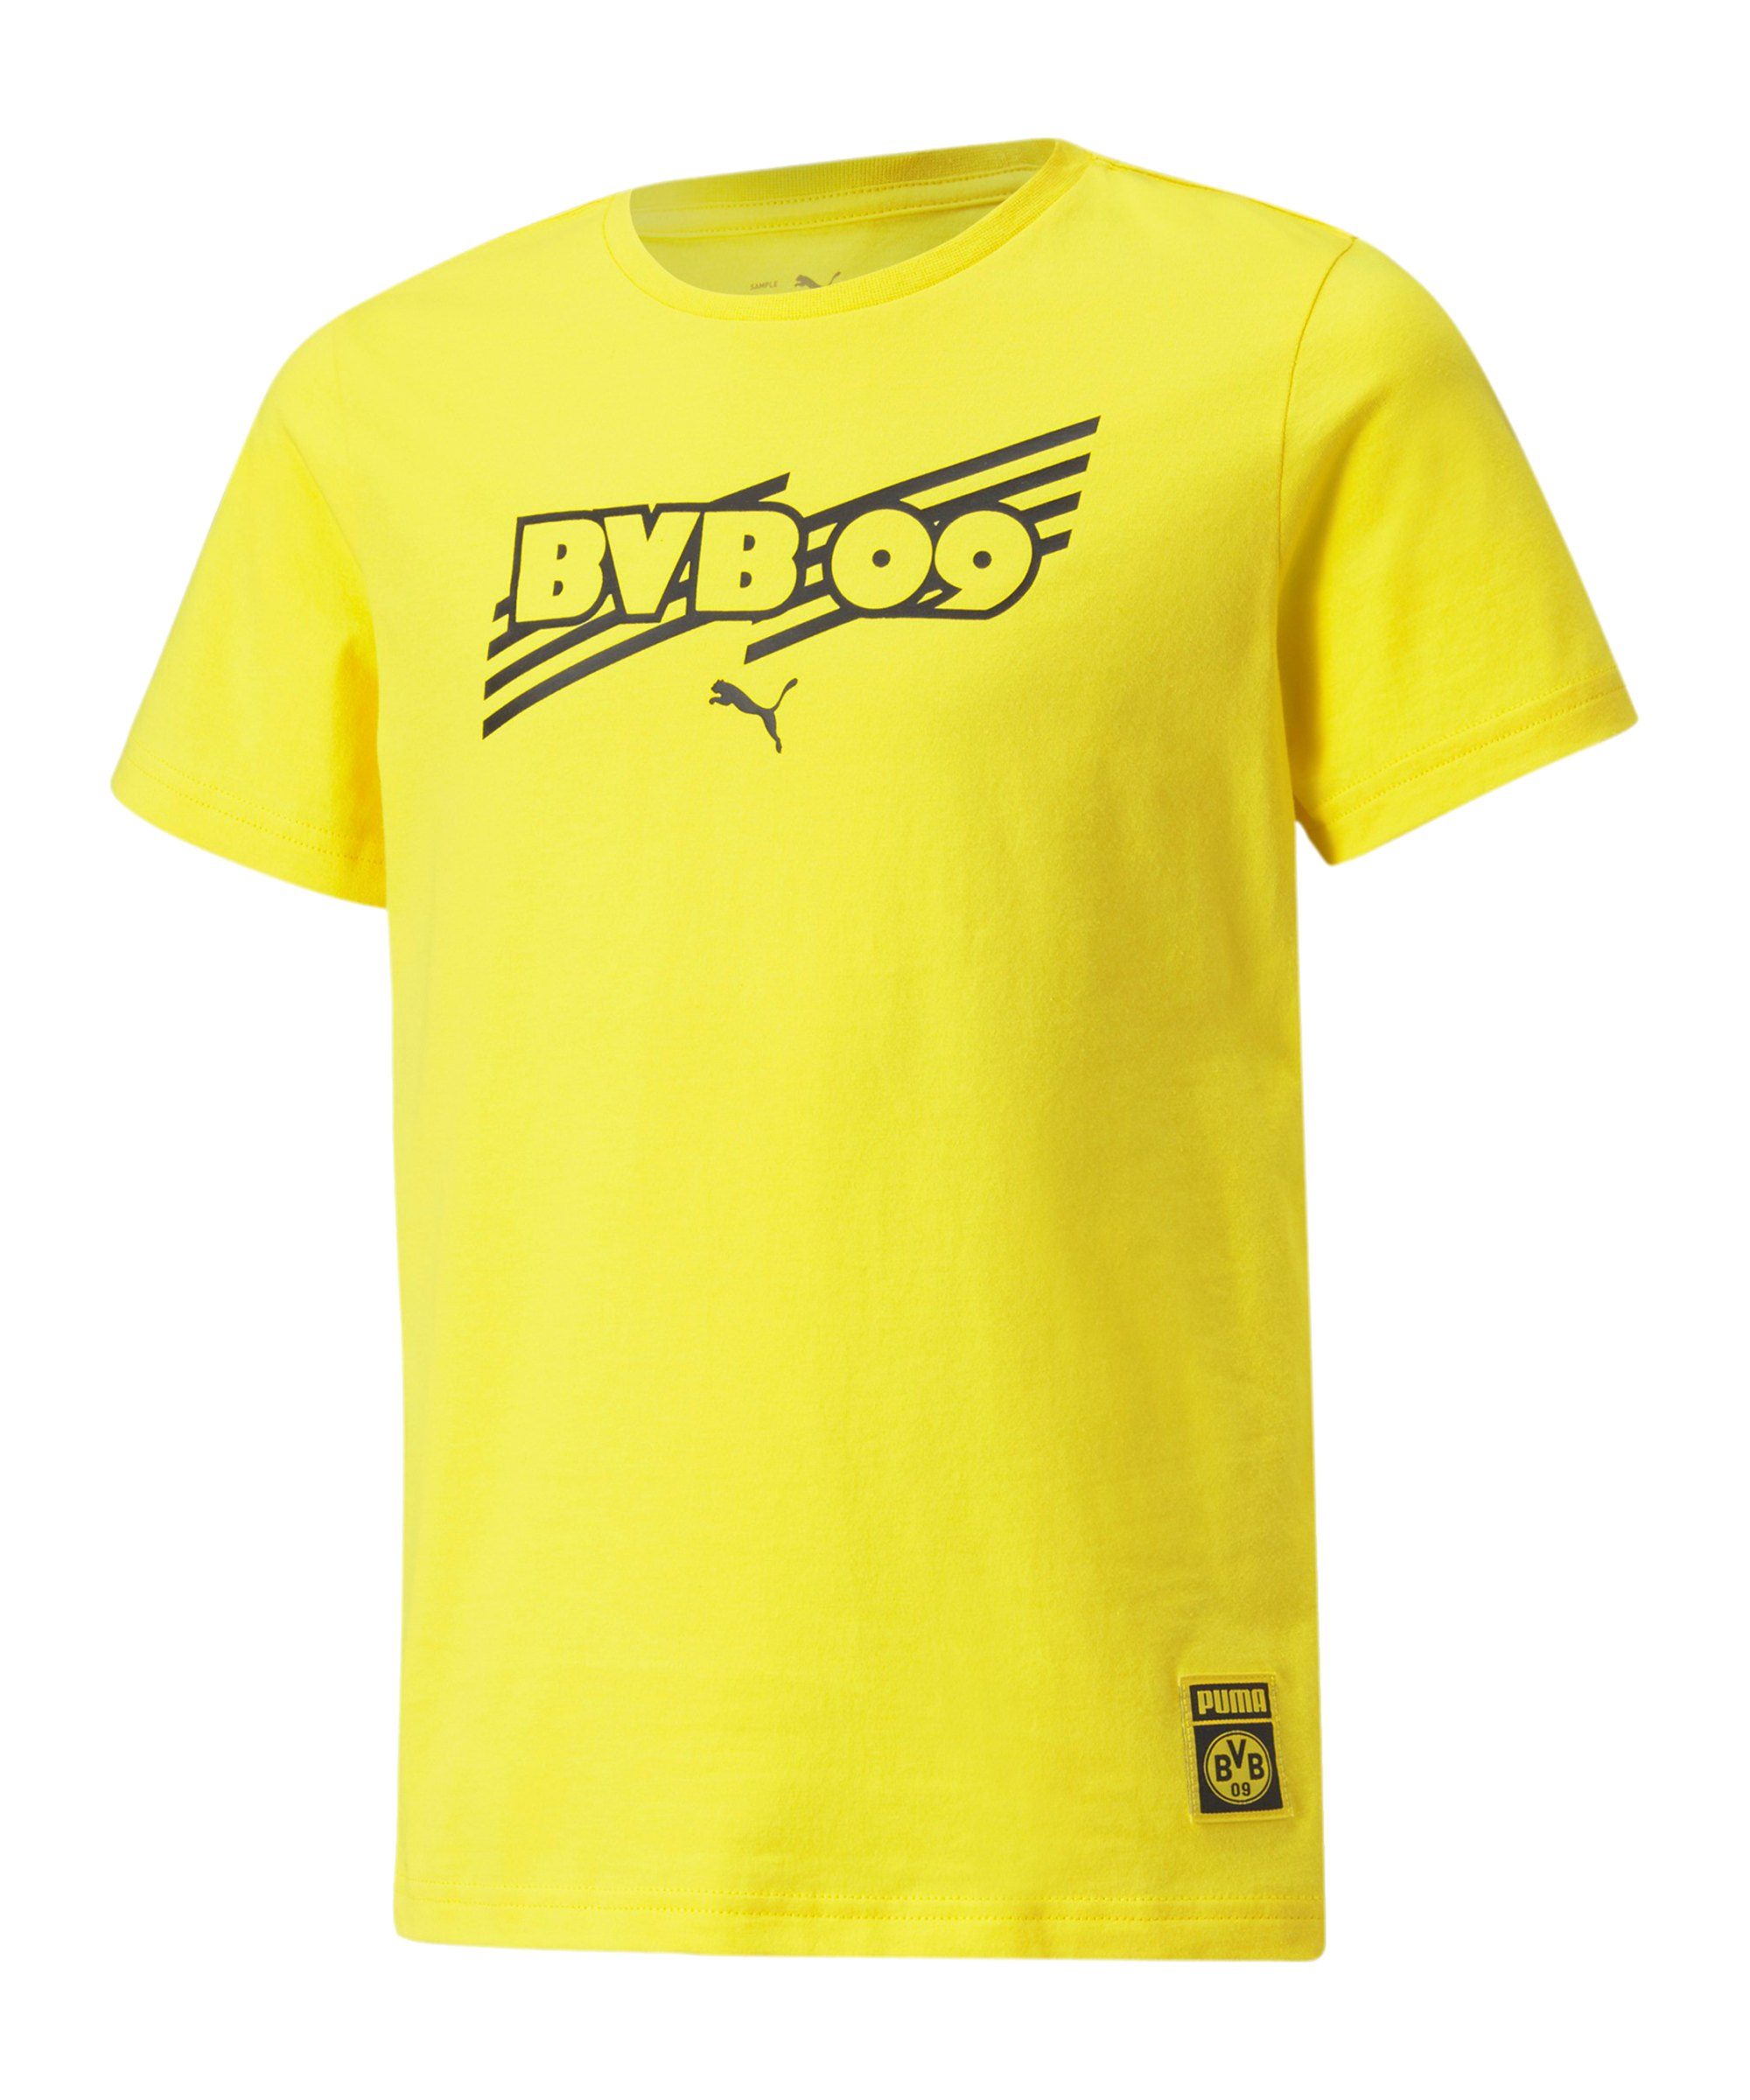 PUMA BVB Dortmund FtblCore T-Shirt Kids F01 - gelb